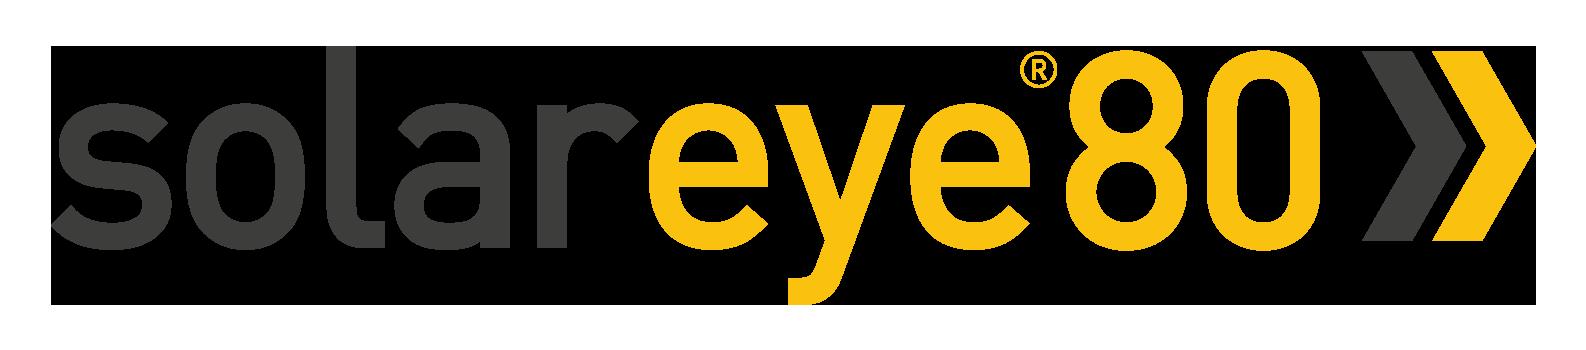 Solareye®80 | solar-powered light